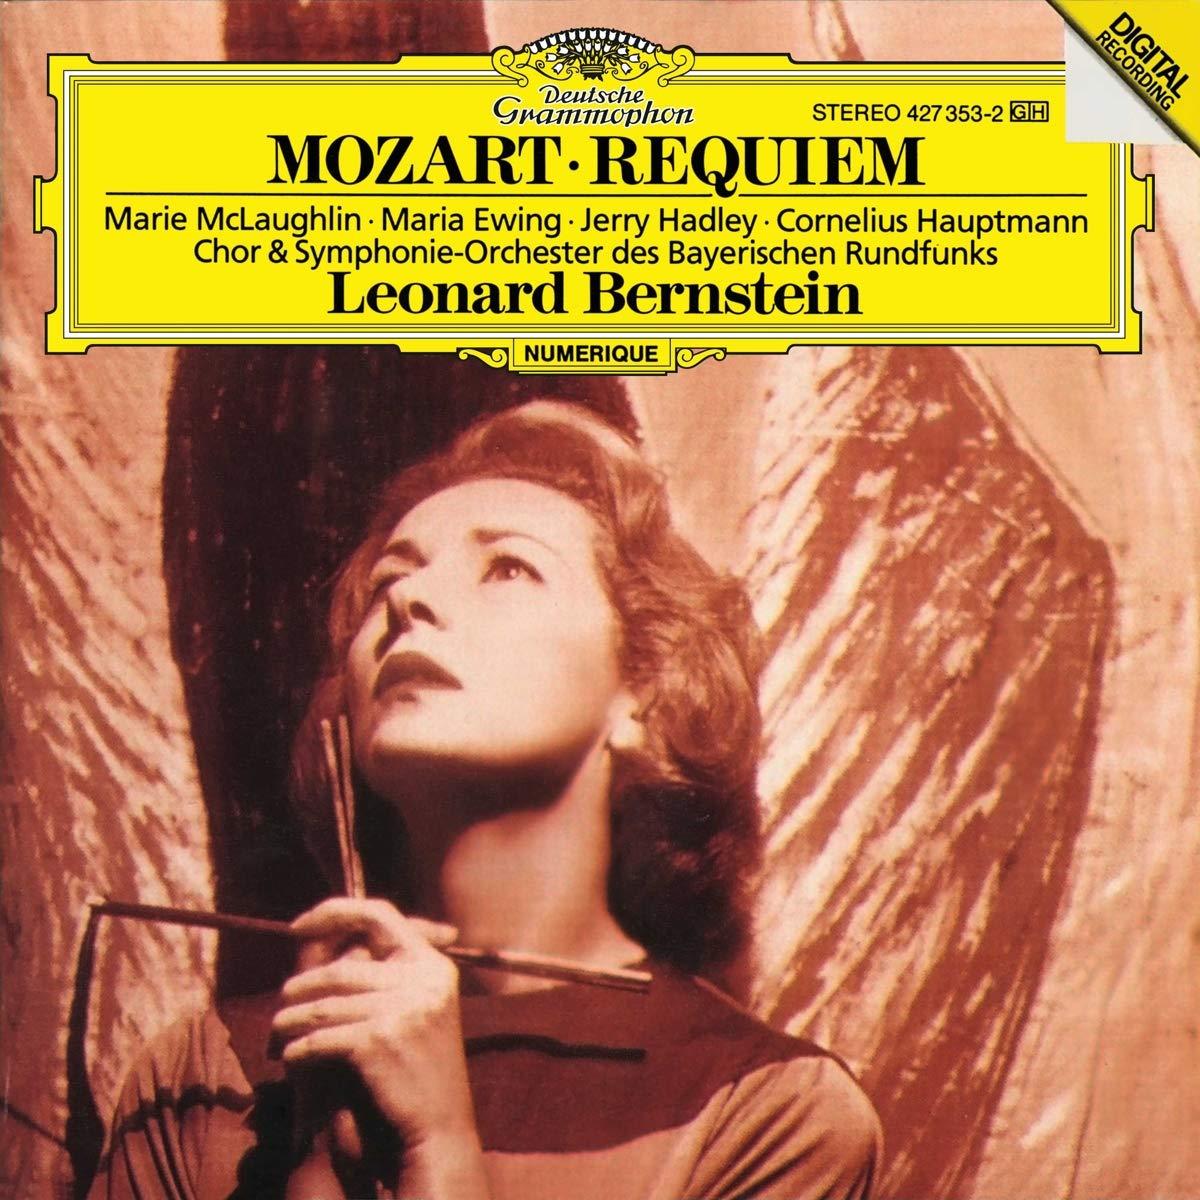 Requiem - Bernstein, Leonard, Sobr, Mozart, Wolfgang Amadeus: Amazon.de:  Musik